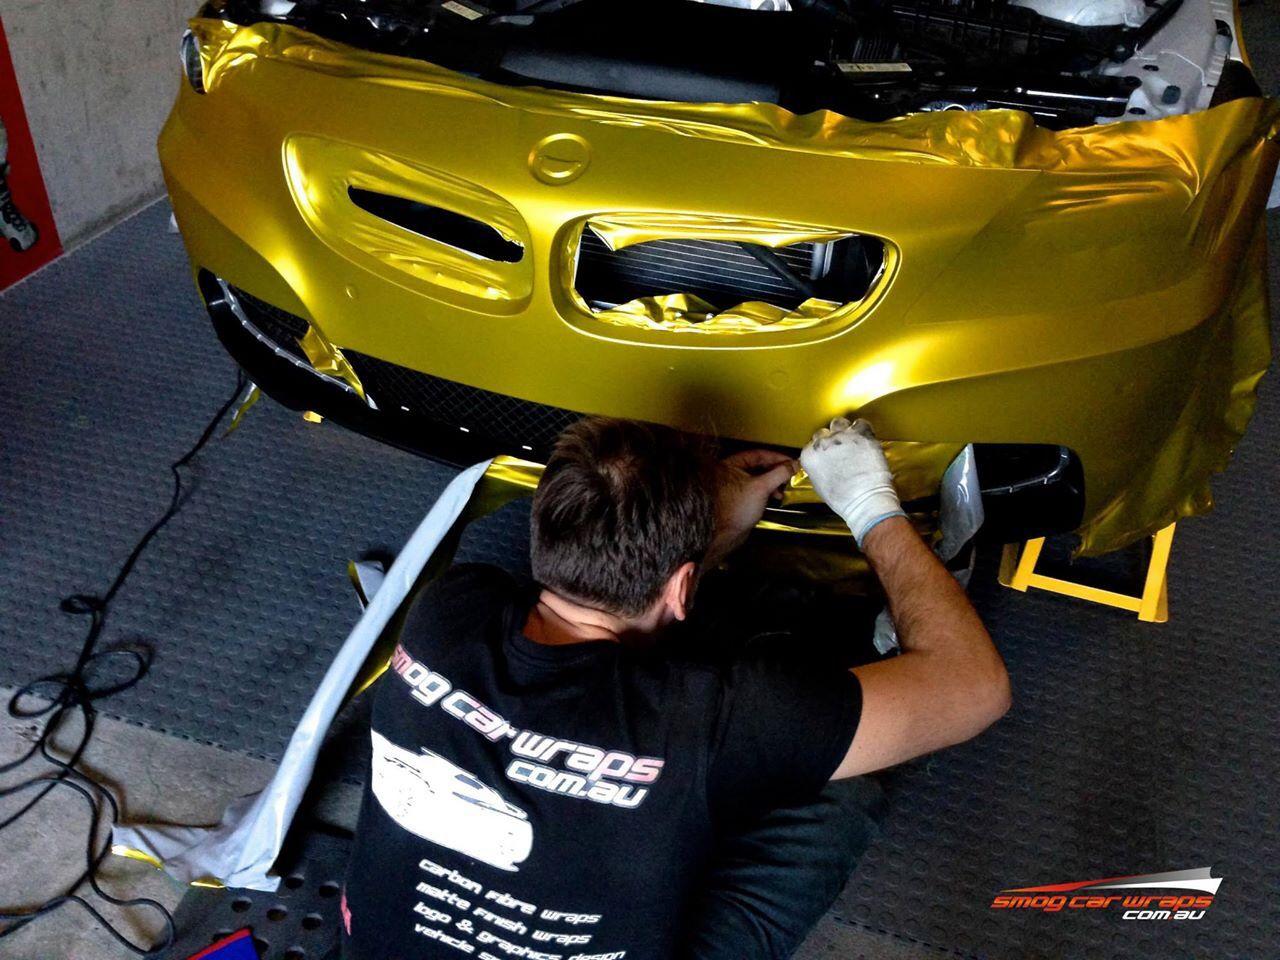 Satin chrome gold vinyl wrap Vinyl wrap car, Car wrap